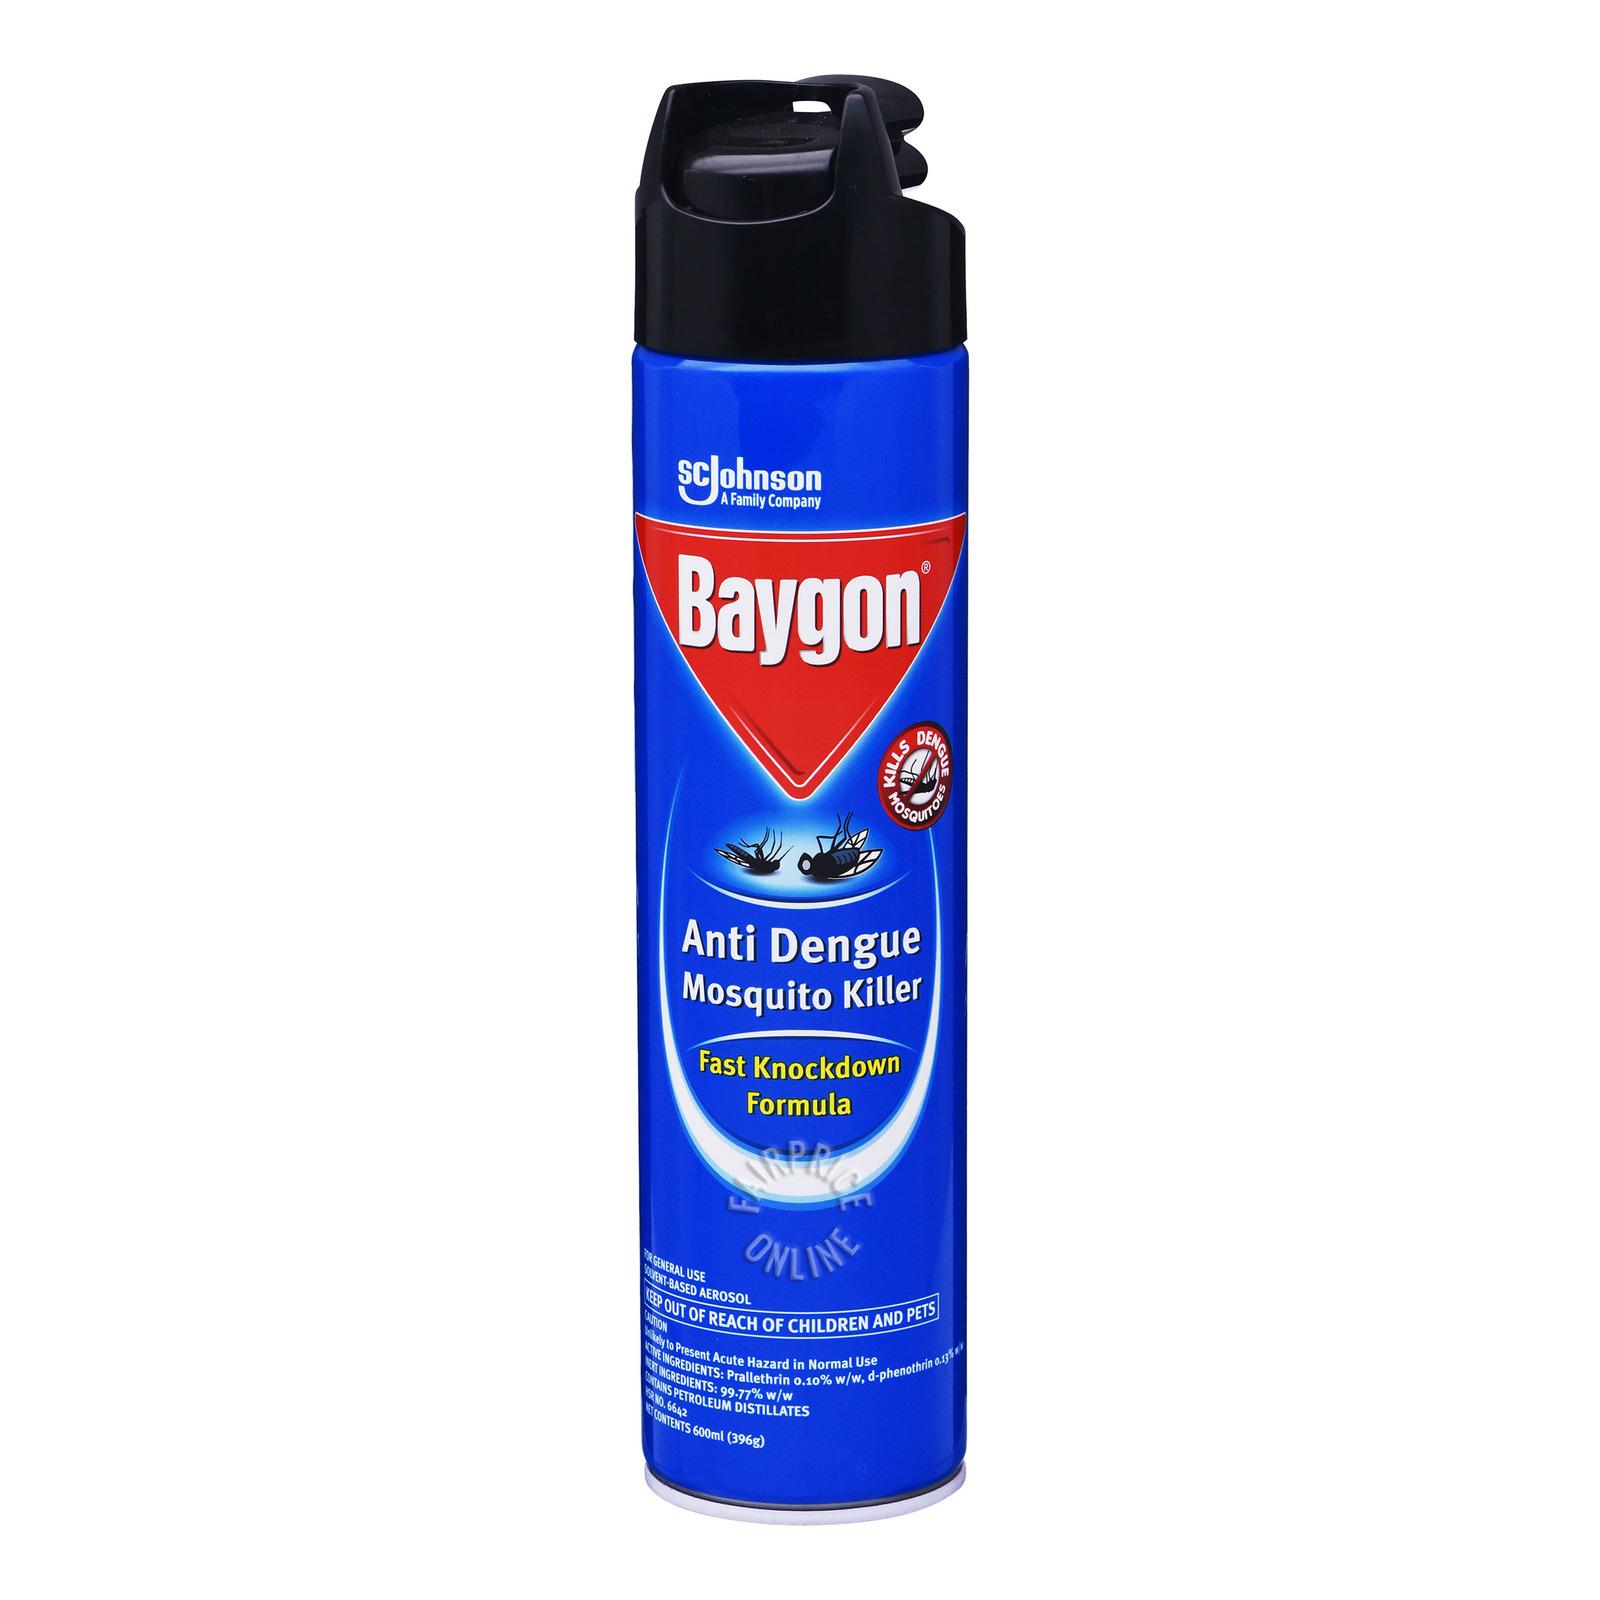 Baygon Anti Dengue Mosquito Killer - Fast Knockdown Formula